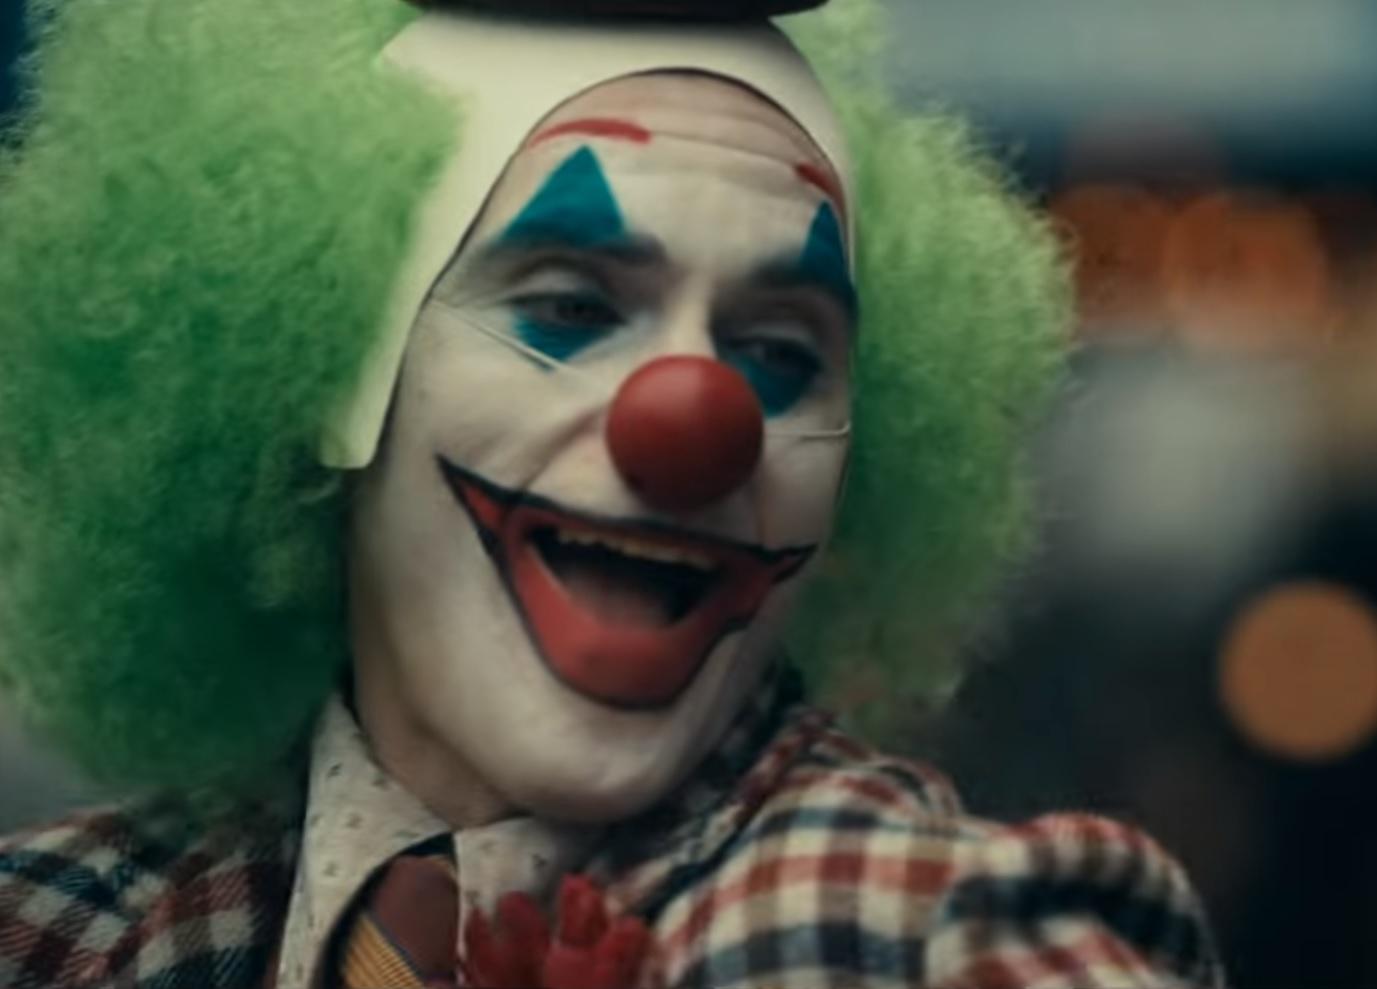 After Porn Ends 2017 Trailer joker trailer breakdown and analysis | den of geek